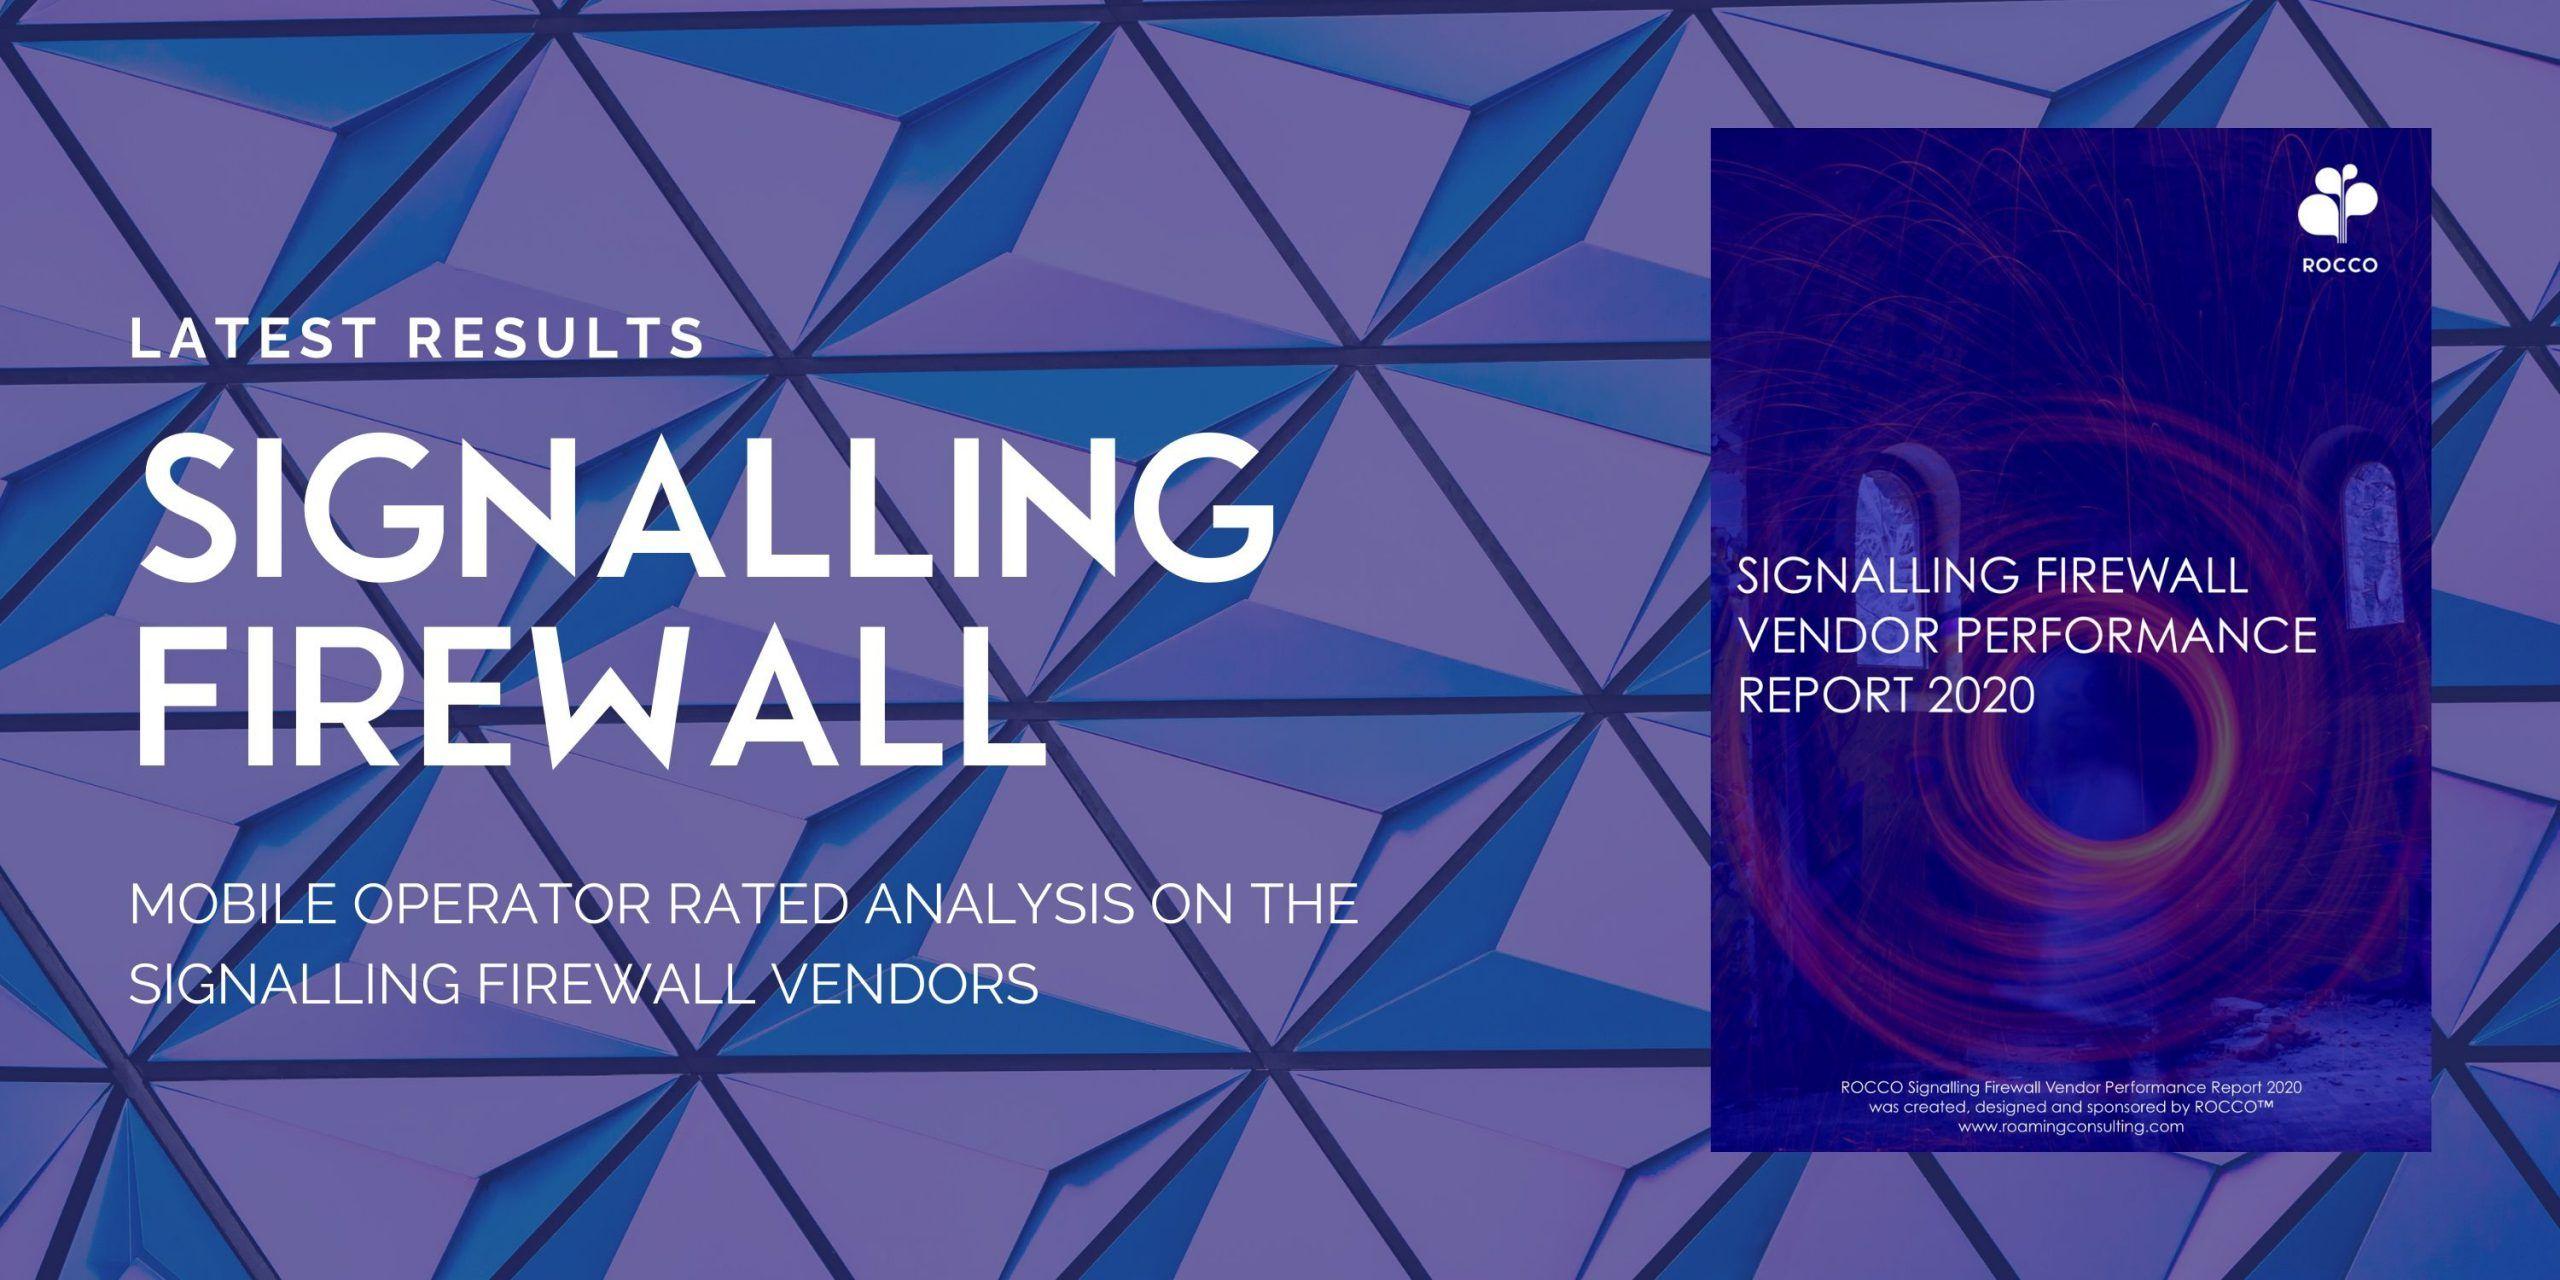 RESULTS: Signalling Firewall Vendor Performance 2020